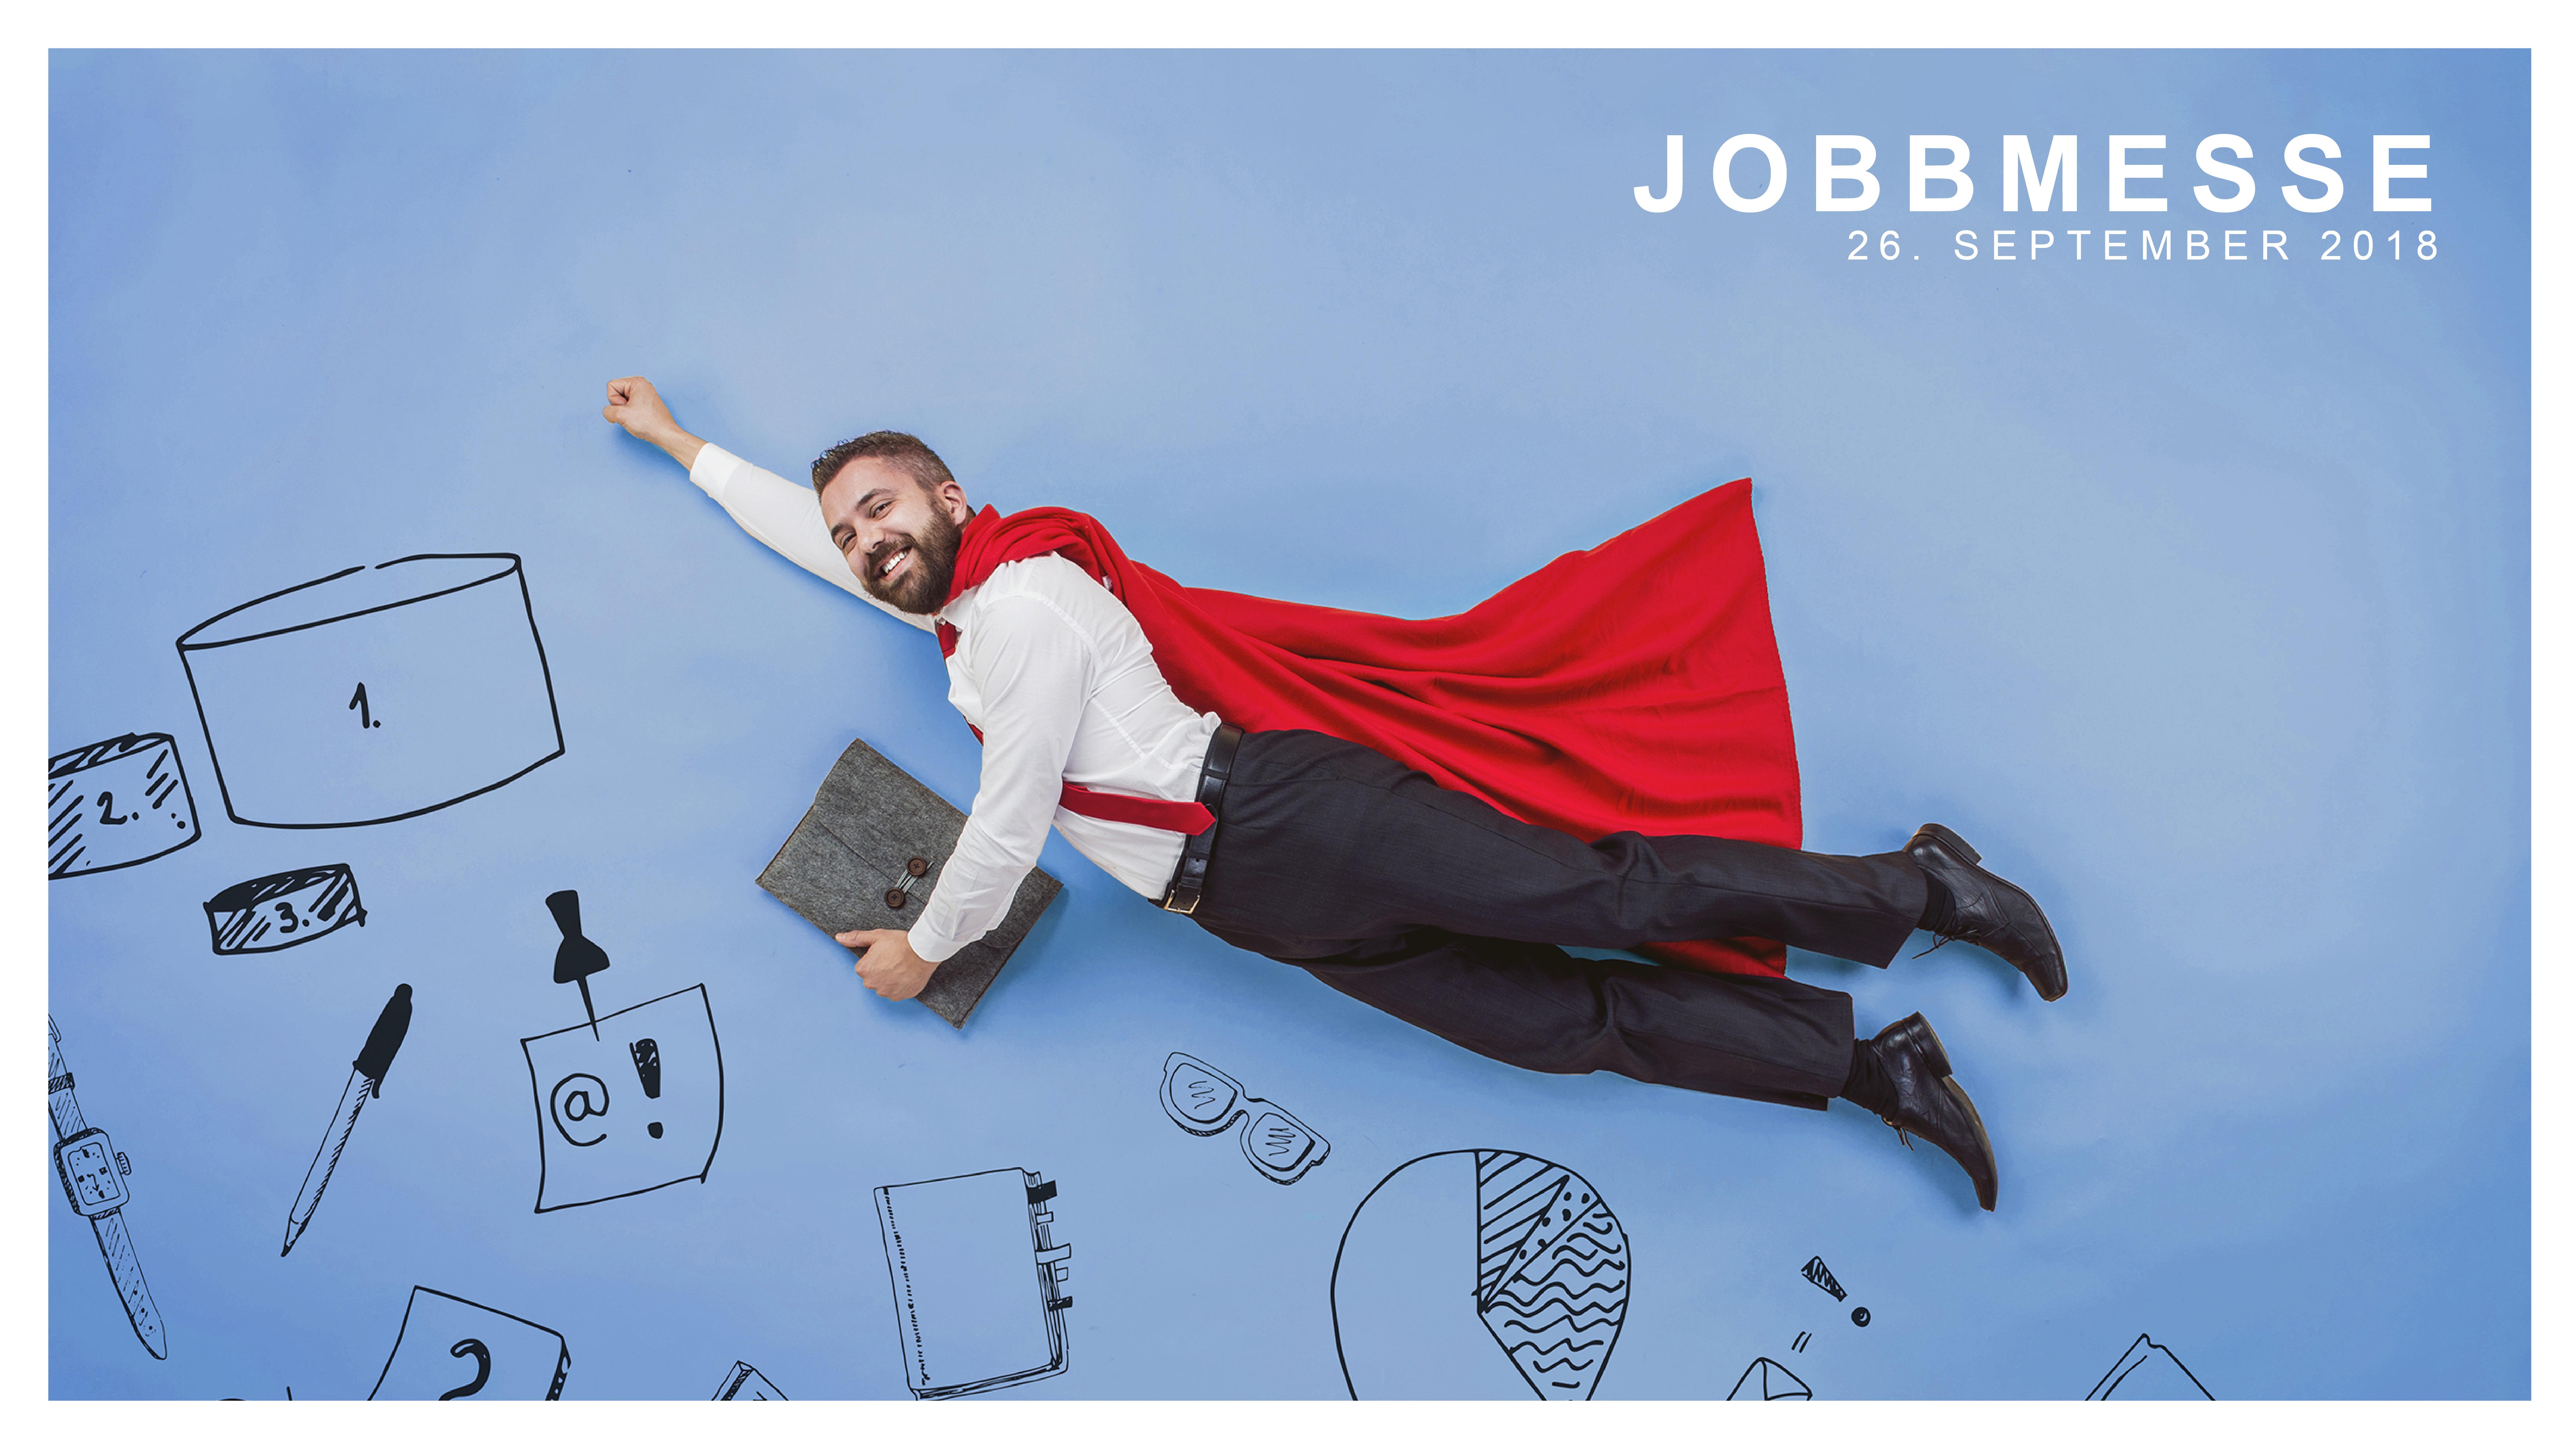 Jobbmesse 2018